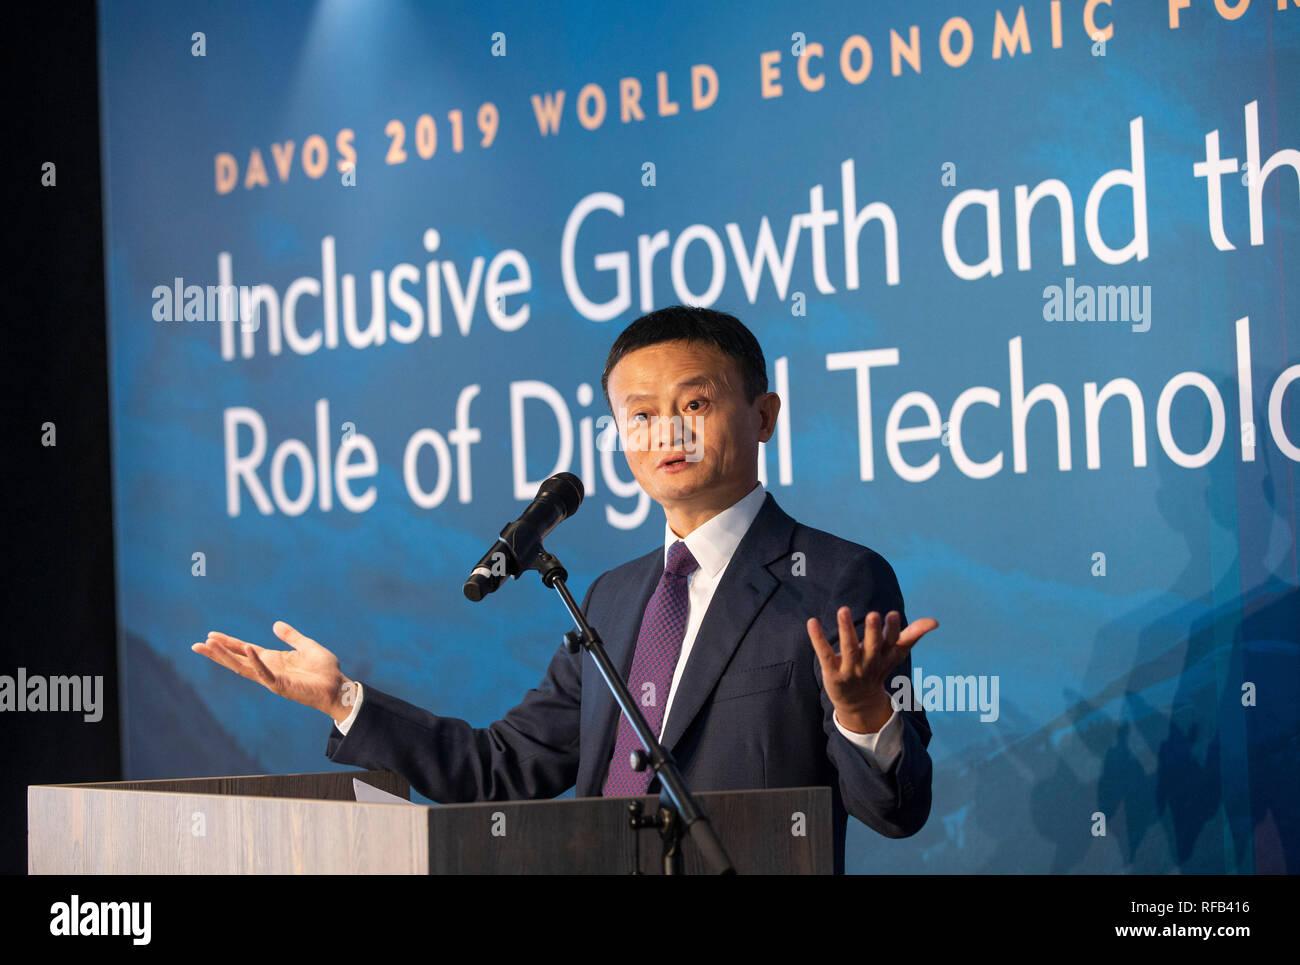 Davos World Economic Forum Group Stock Photos Davos World Economic